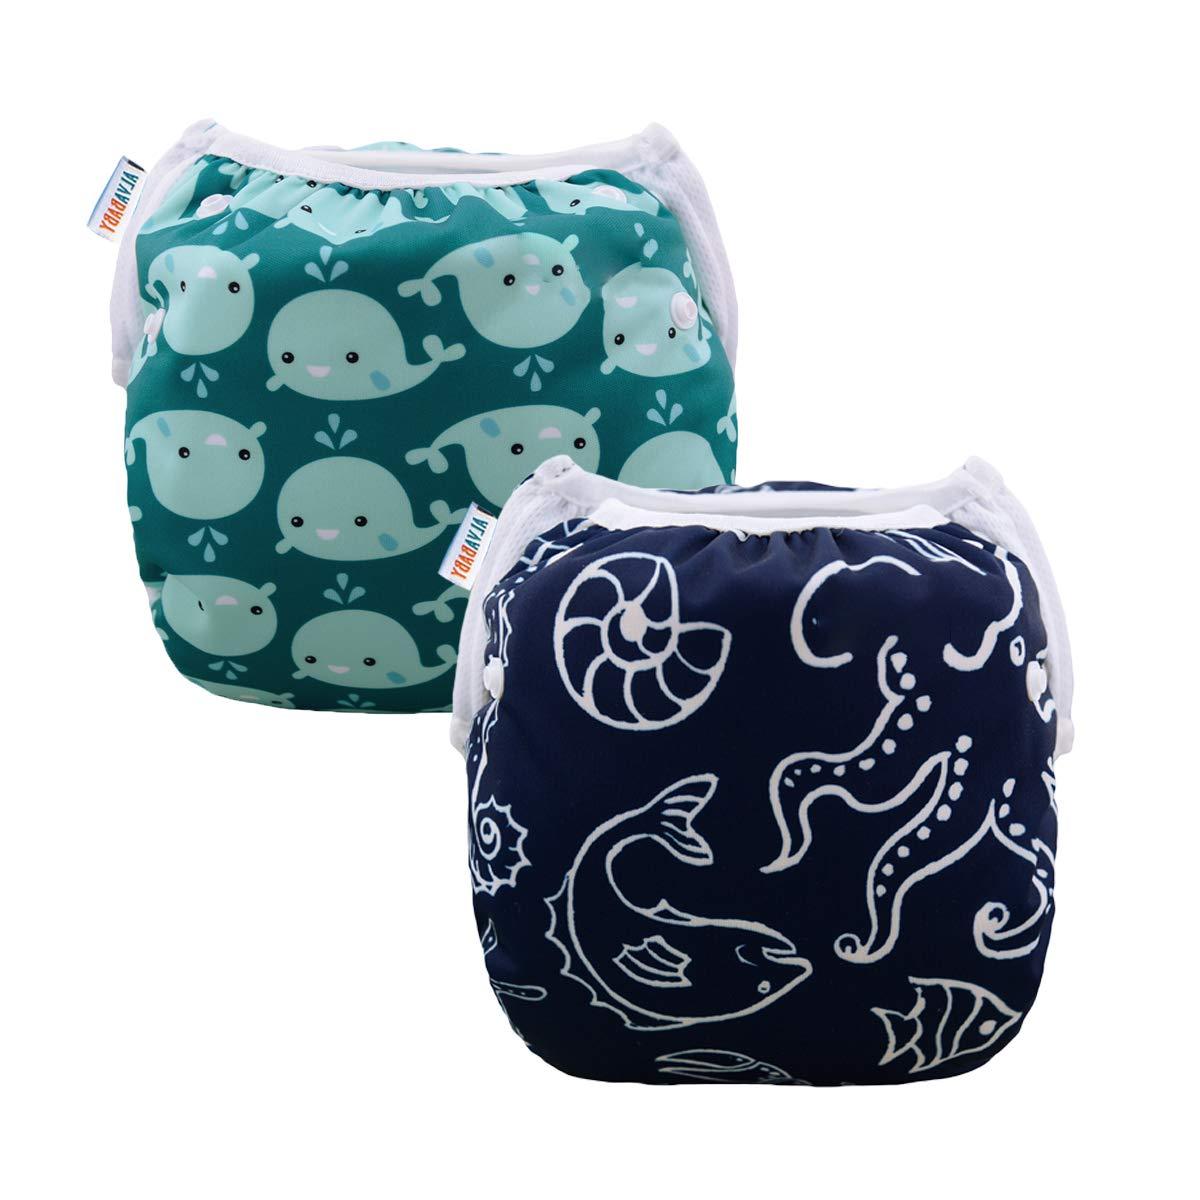 ALVABABY Swim Diapers Boys & Girls Reuseable Adjustable 2pcs 0-2 Years SW18-21